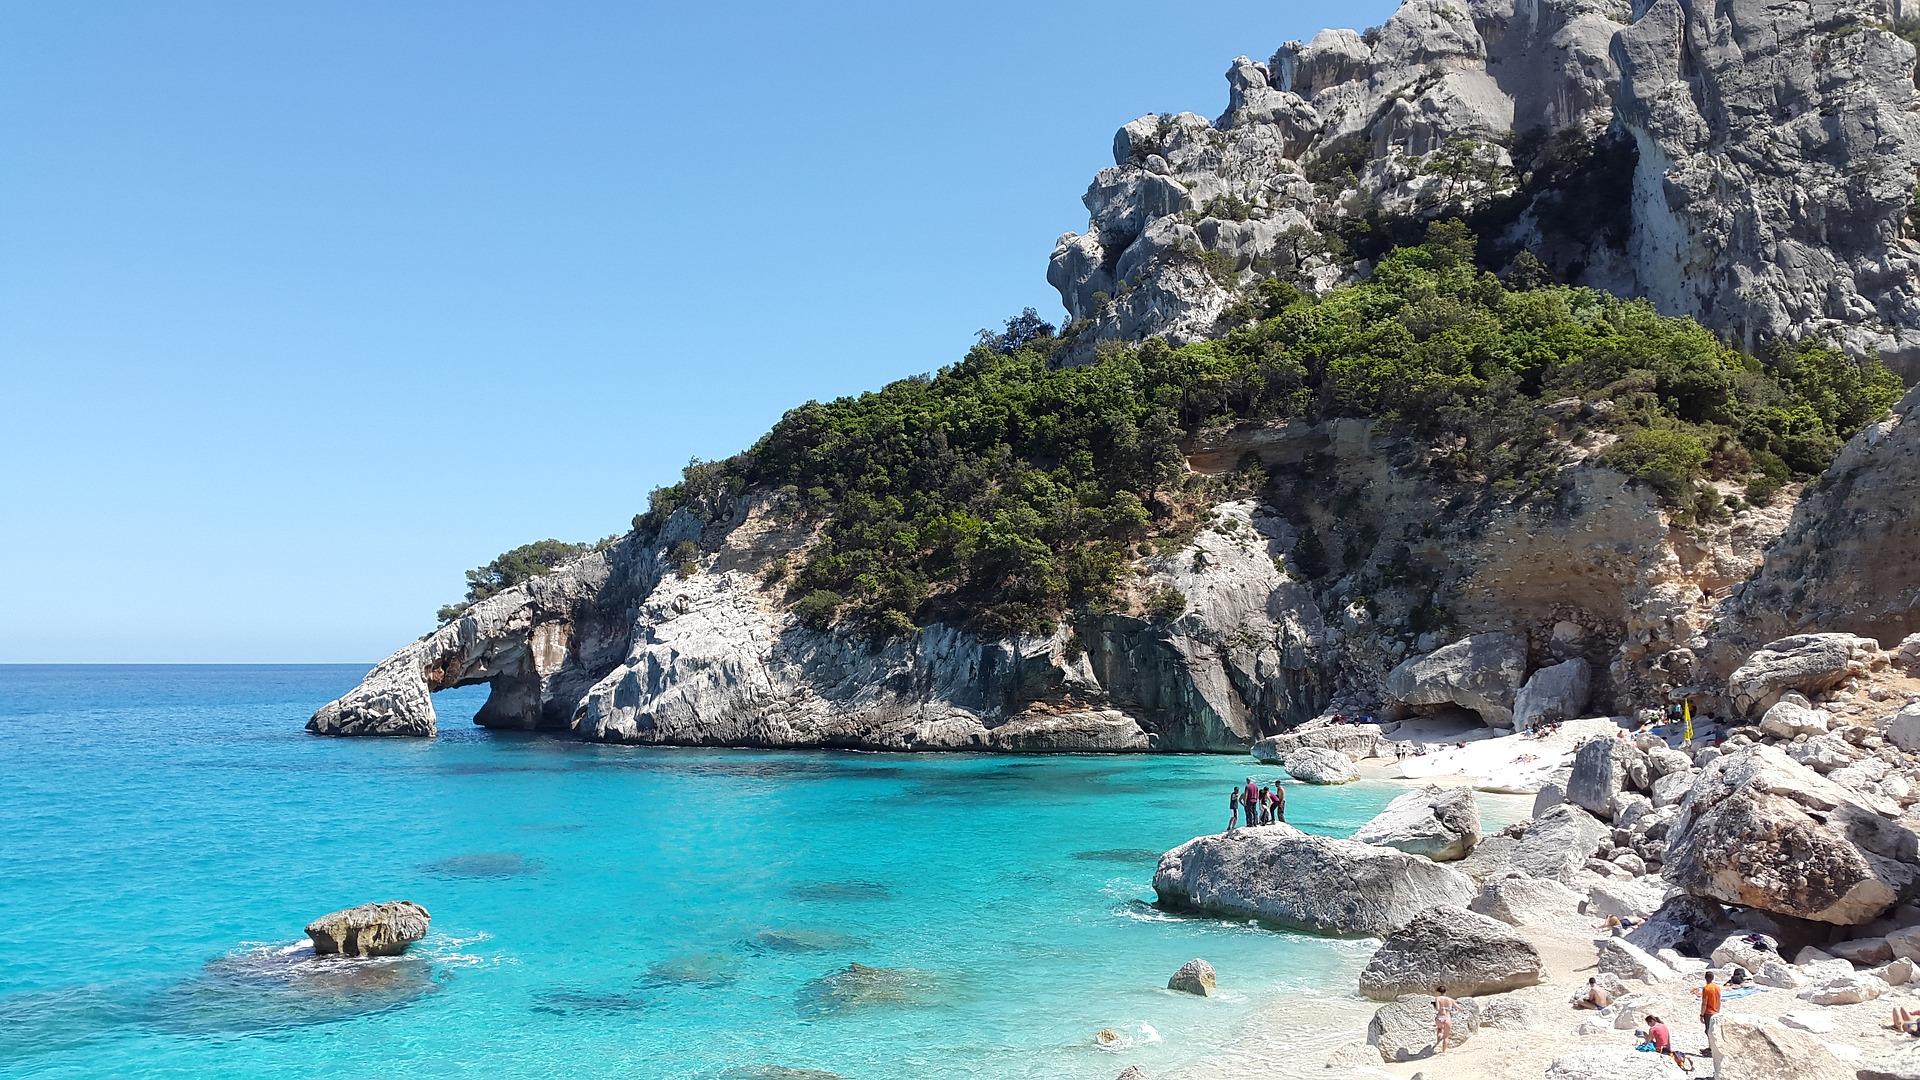 Beach in Sardinia